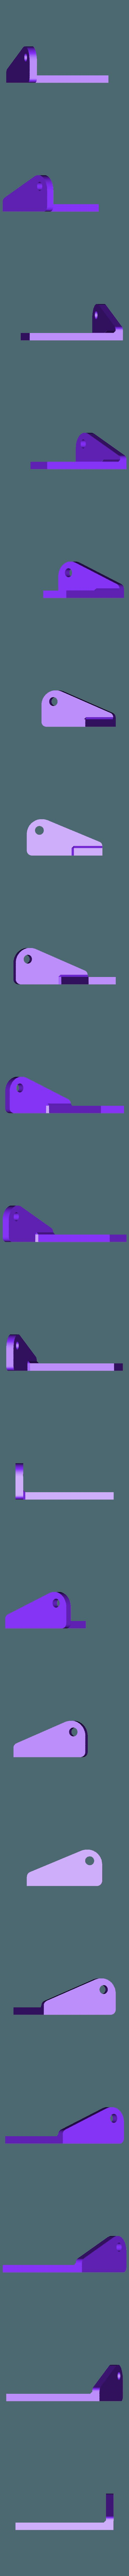 DF4J_SUPPORT_LIGHT_BAR_RIGHT_20190218.stl Download free STL file LED light bar for the DF MODELS DF-4J • Design to 3D print, peterbroeders